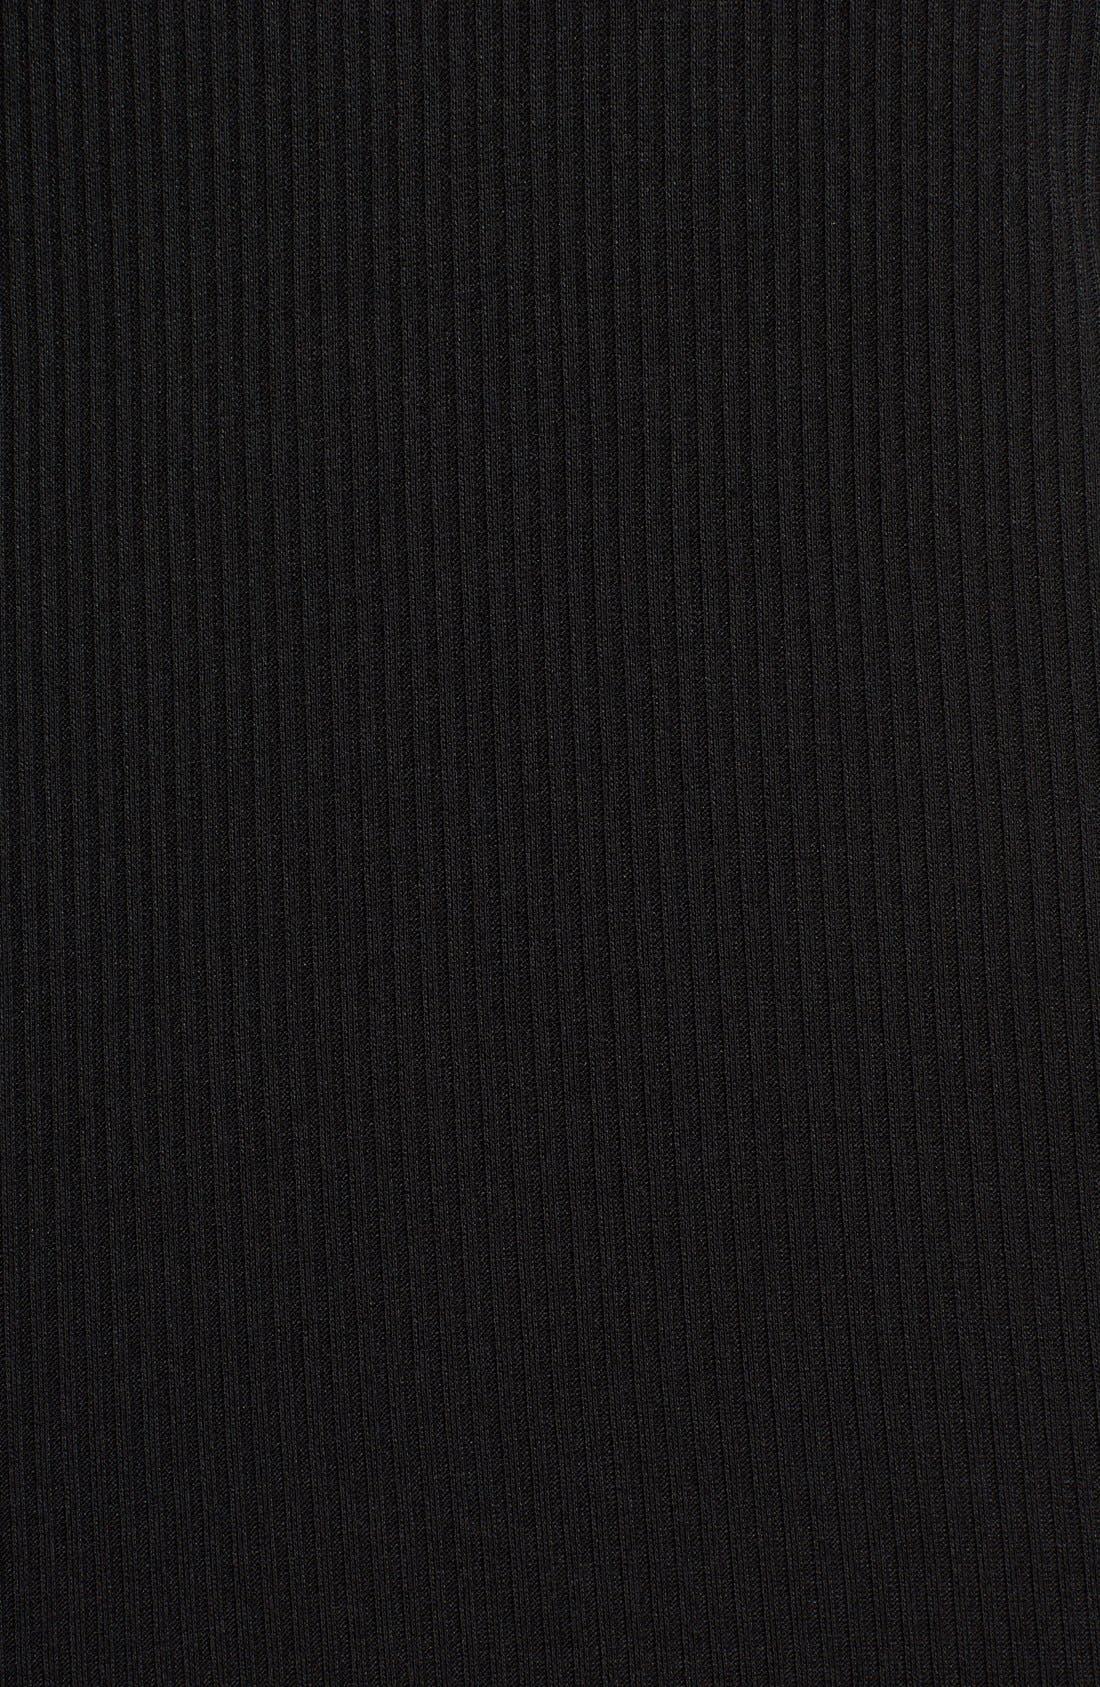 SOCIALITE, Maddie Rib Knit Cowl Shift Dress, Alternate thumbnail 5, color, 001